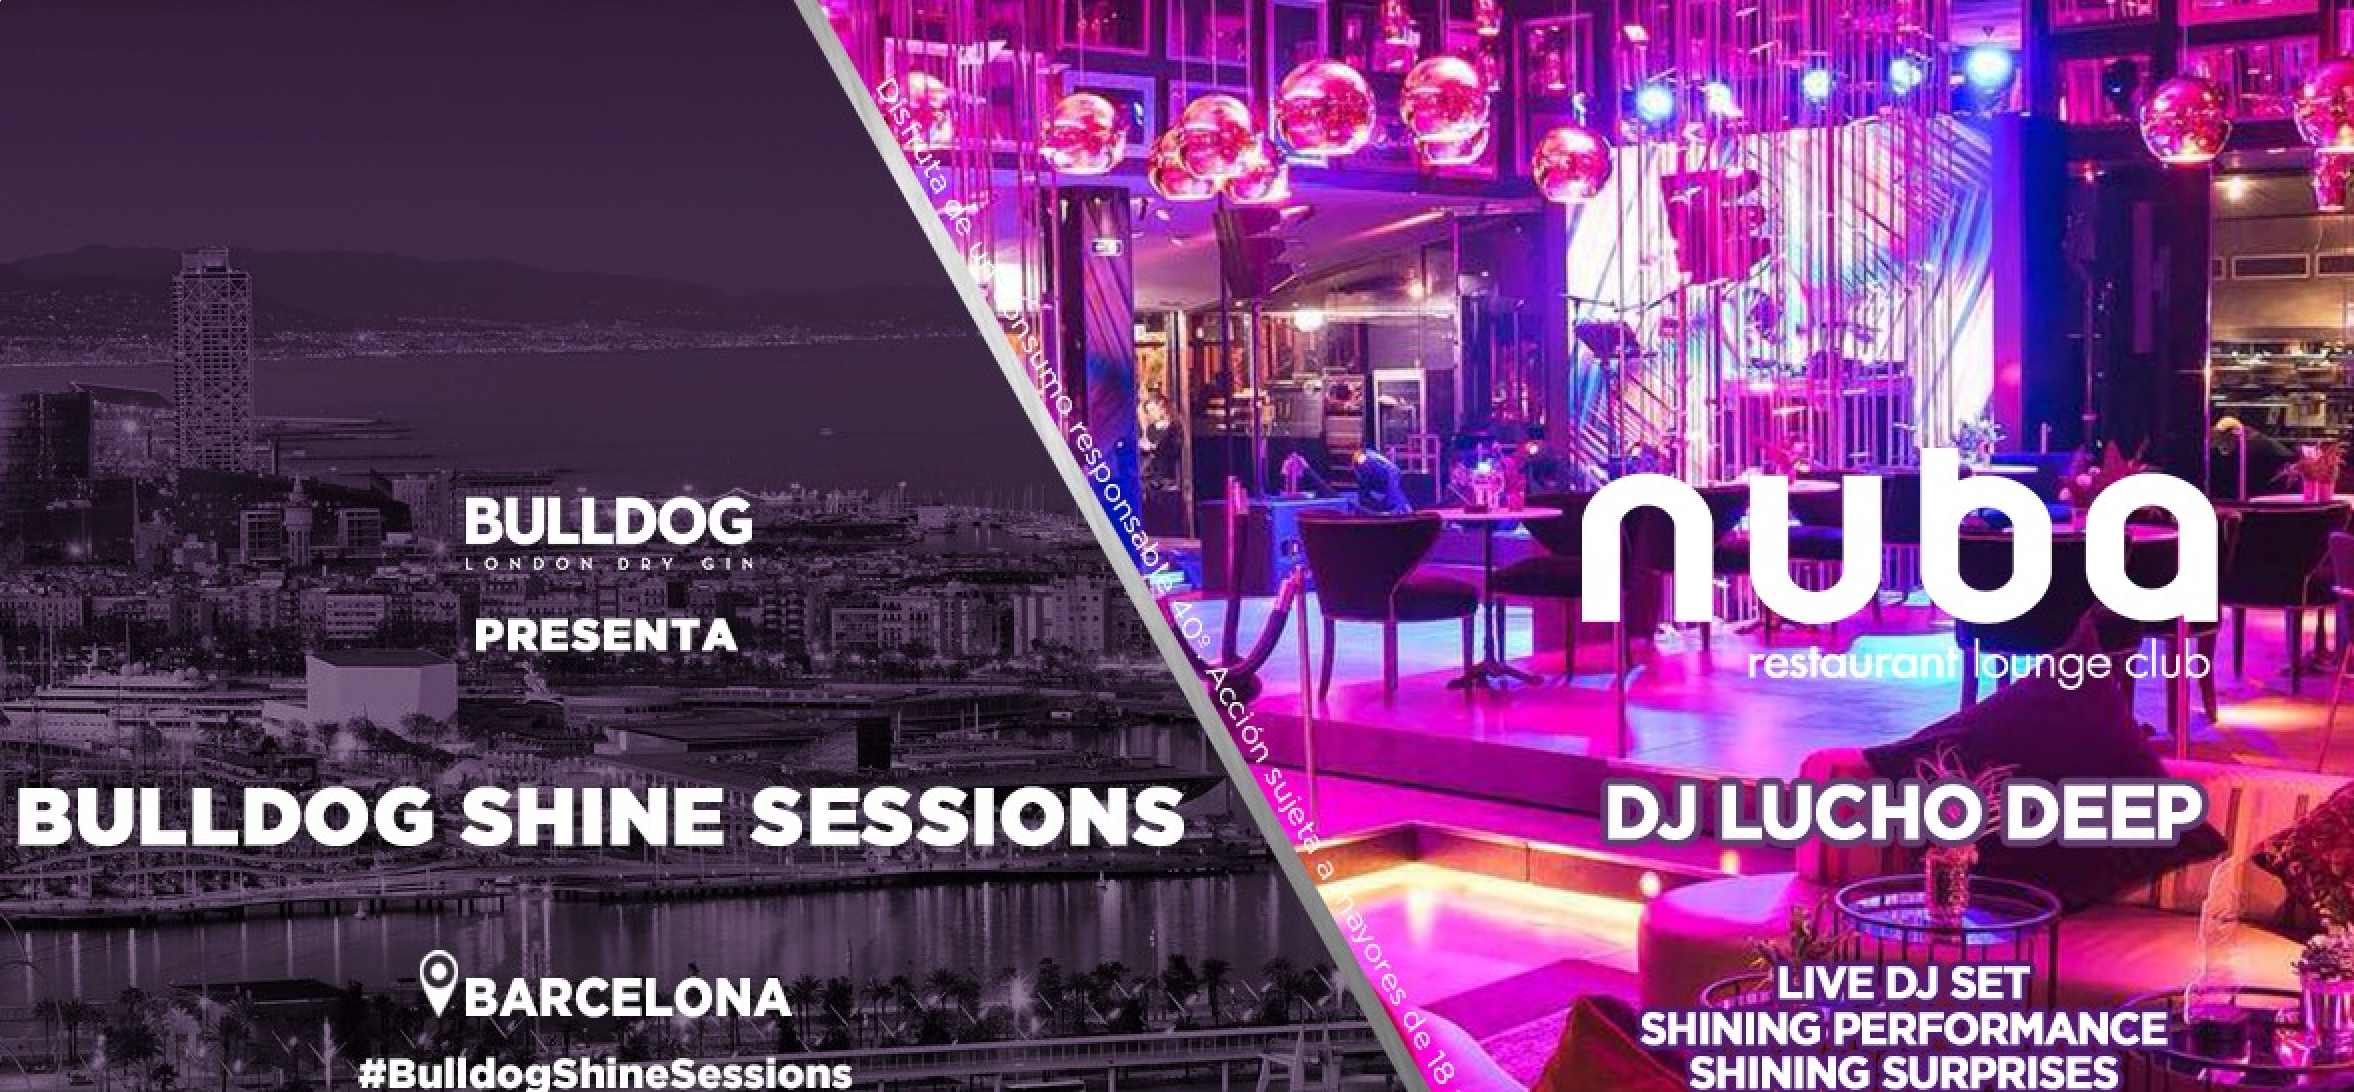 Bulldog Shine Sessions - Club Nuba Lounge